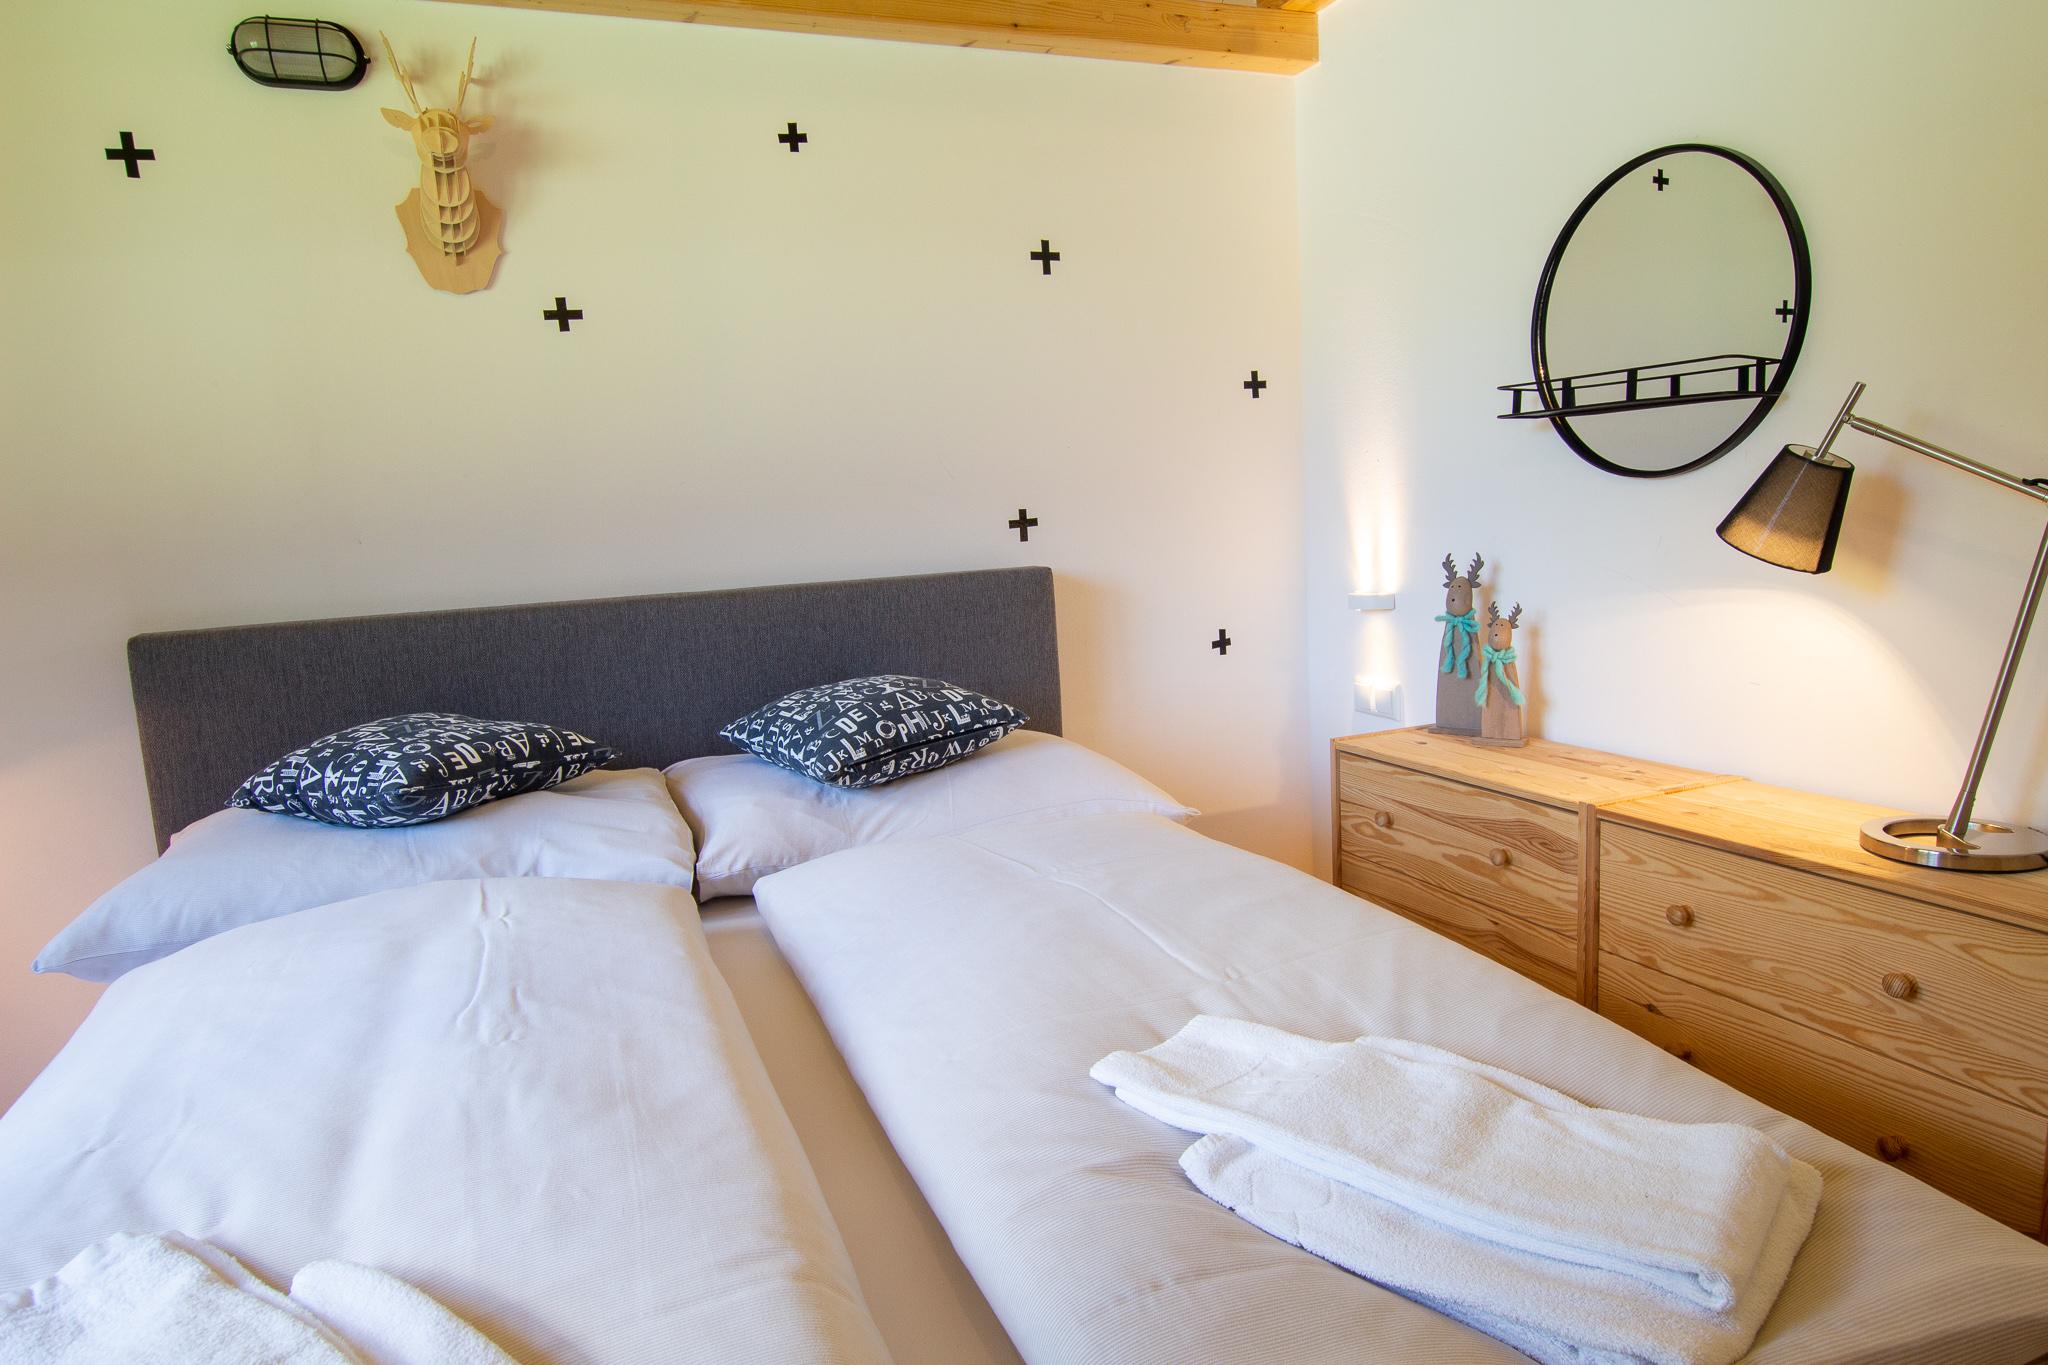 Maison de vacances Lodge Seeblick am Skilift und Bergsee für 5 (2636751), Uttendorf, Pinzgau, Salzbourg, Autriche, image 17